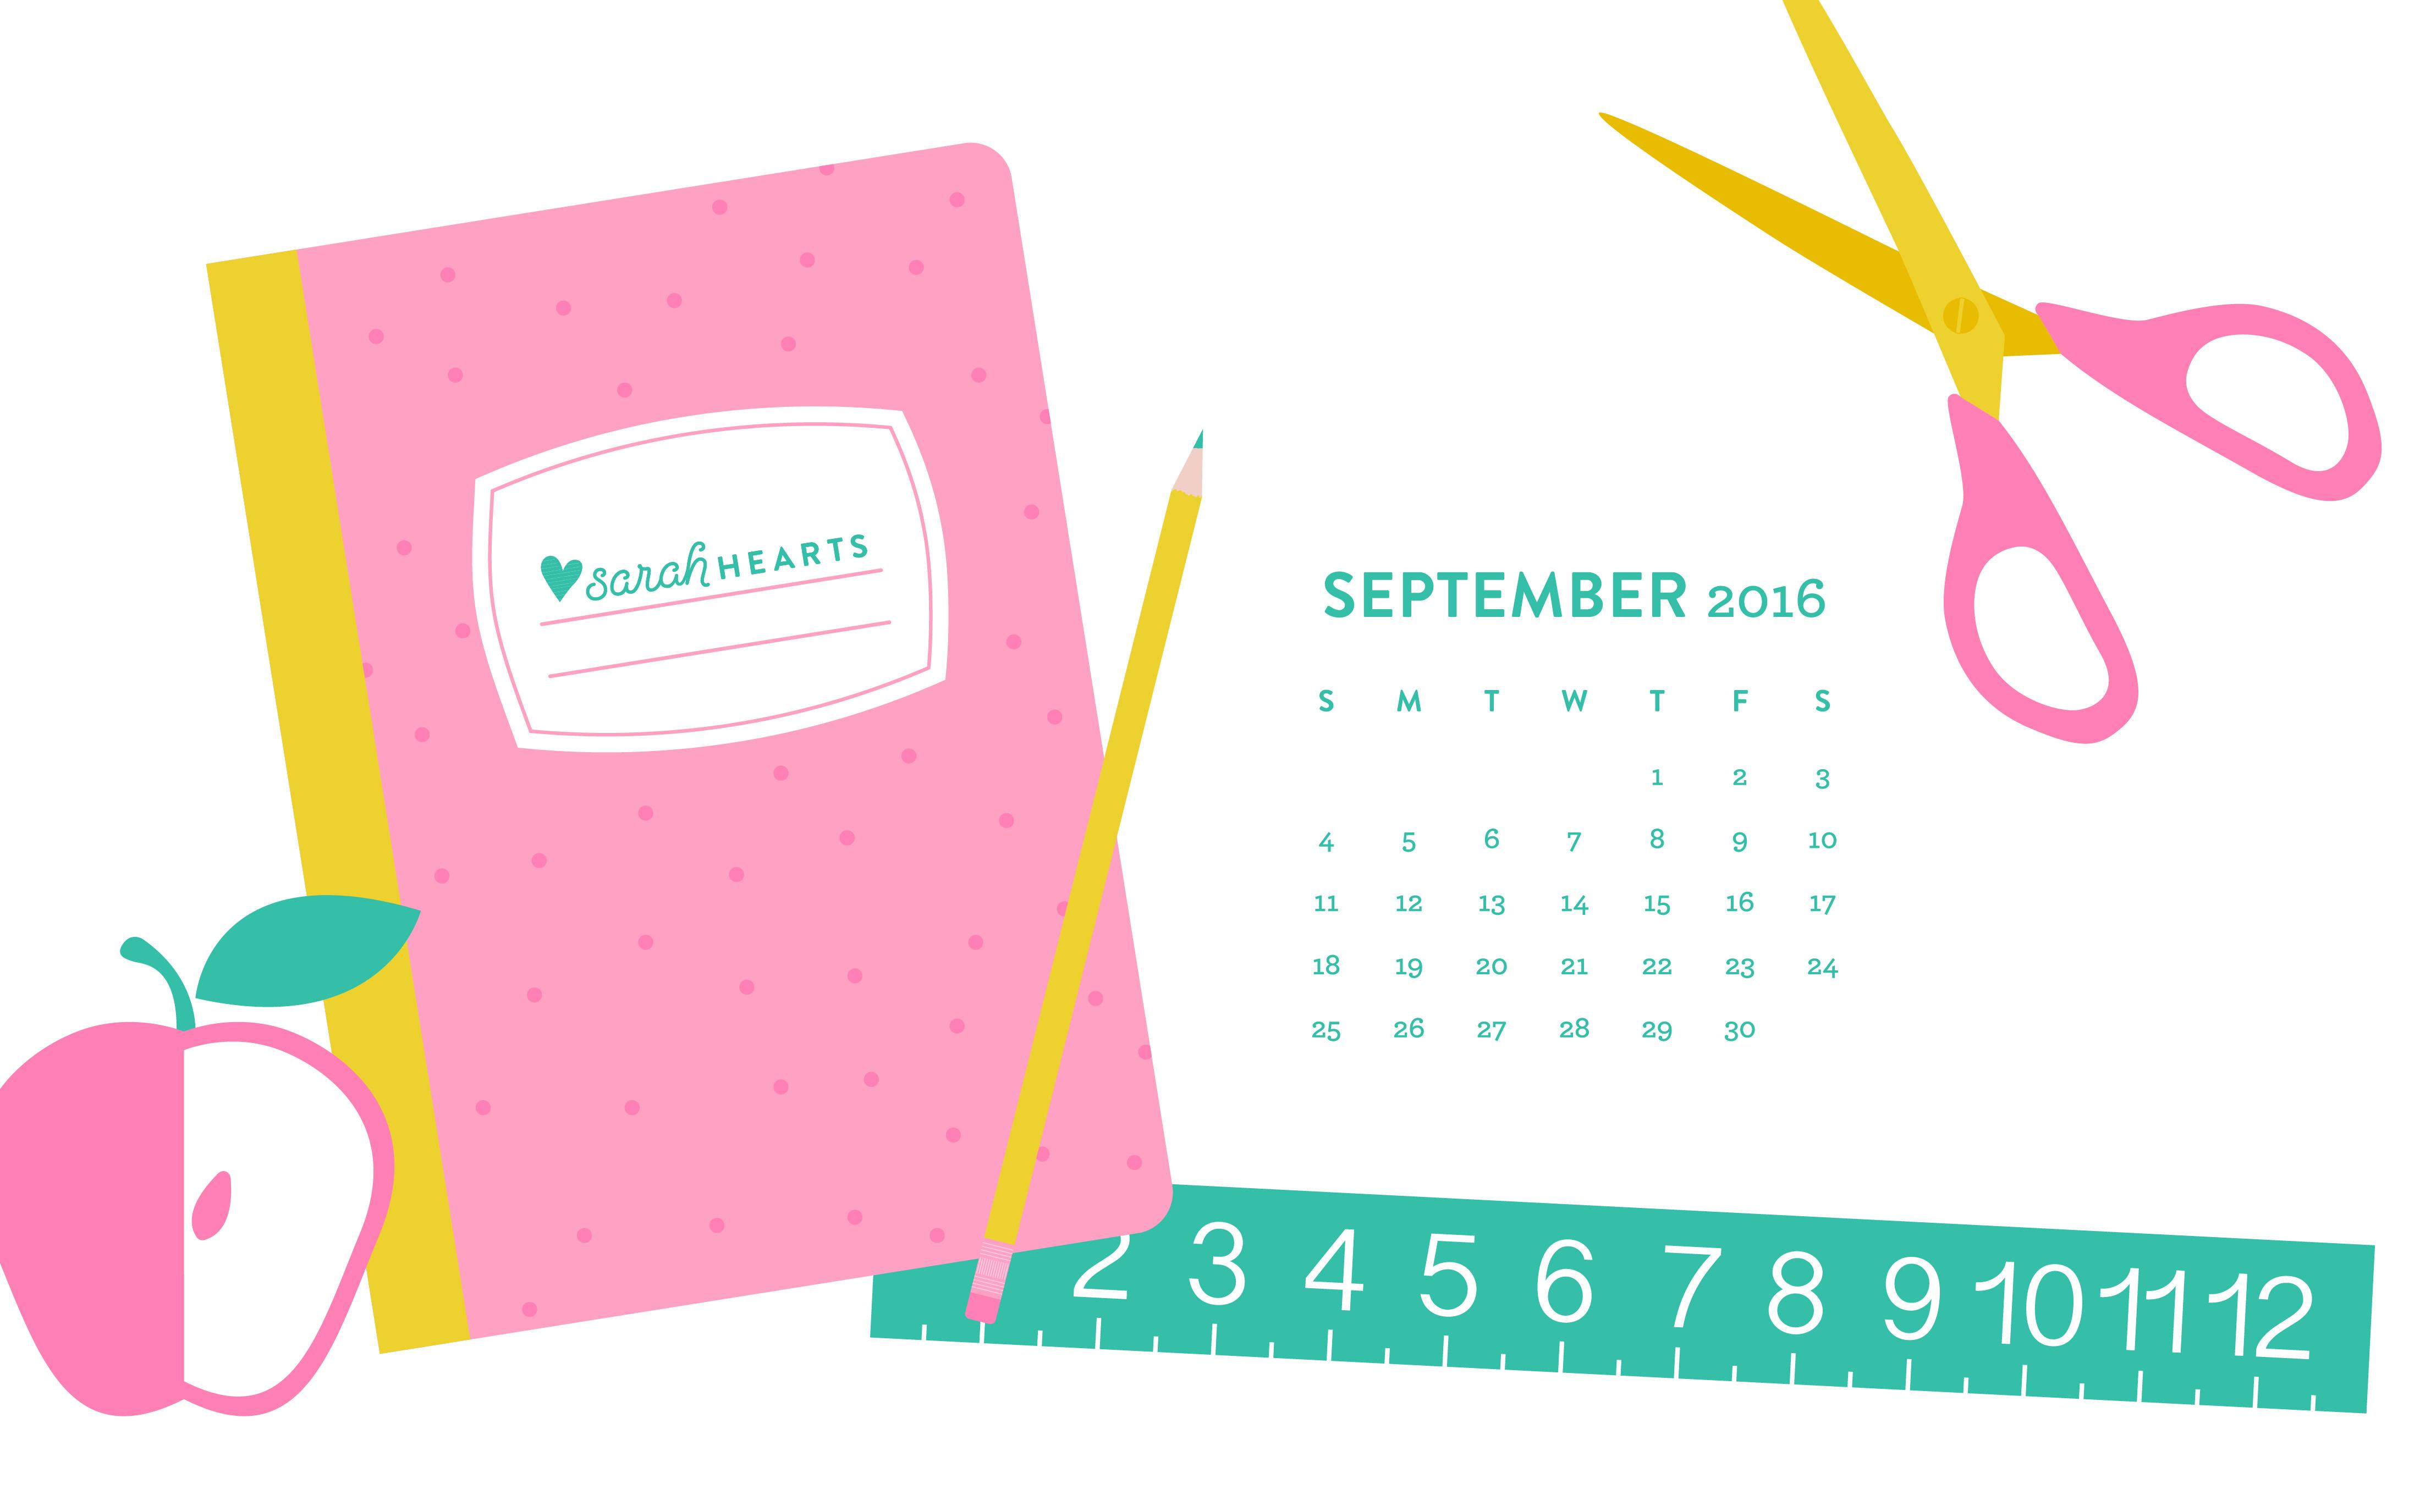 September 2016 Back to School Calendar Wallpaper   Sarah Hearts 4400x2750